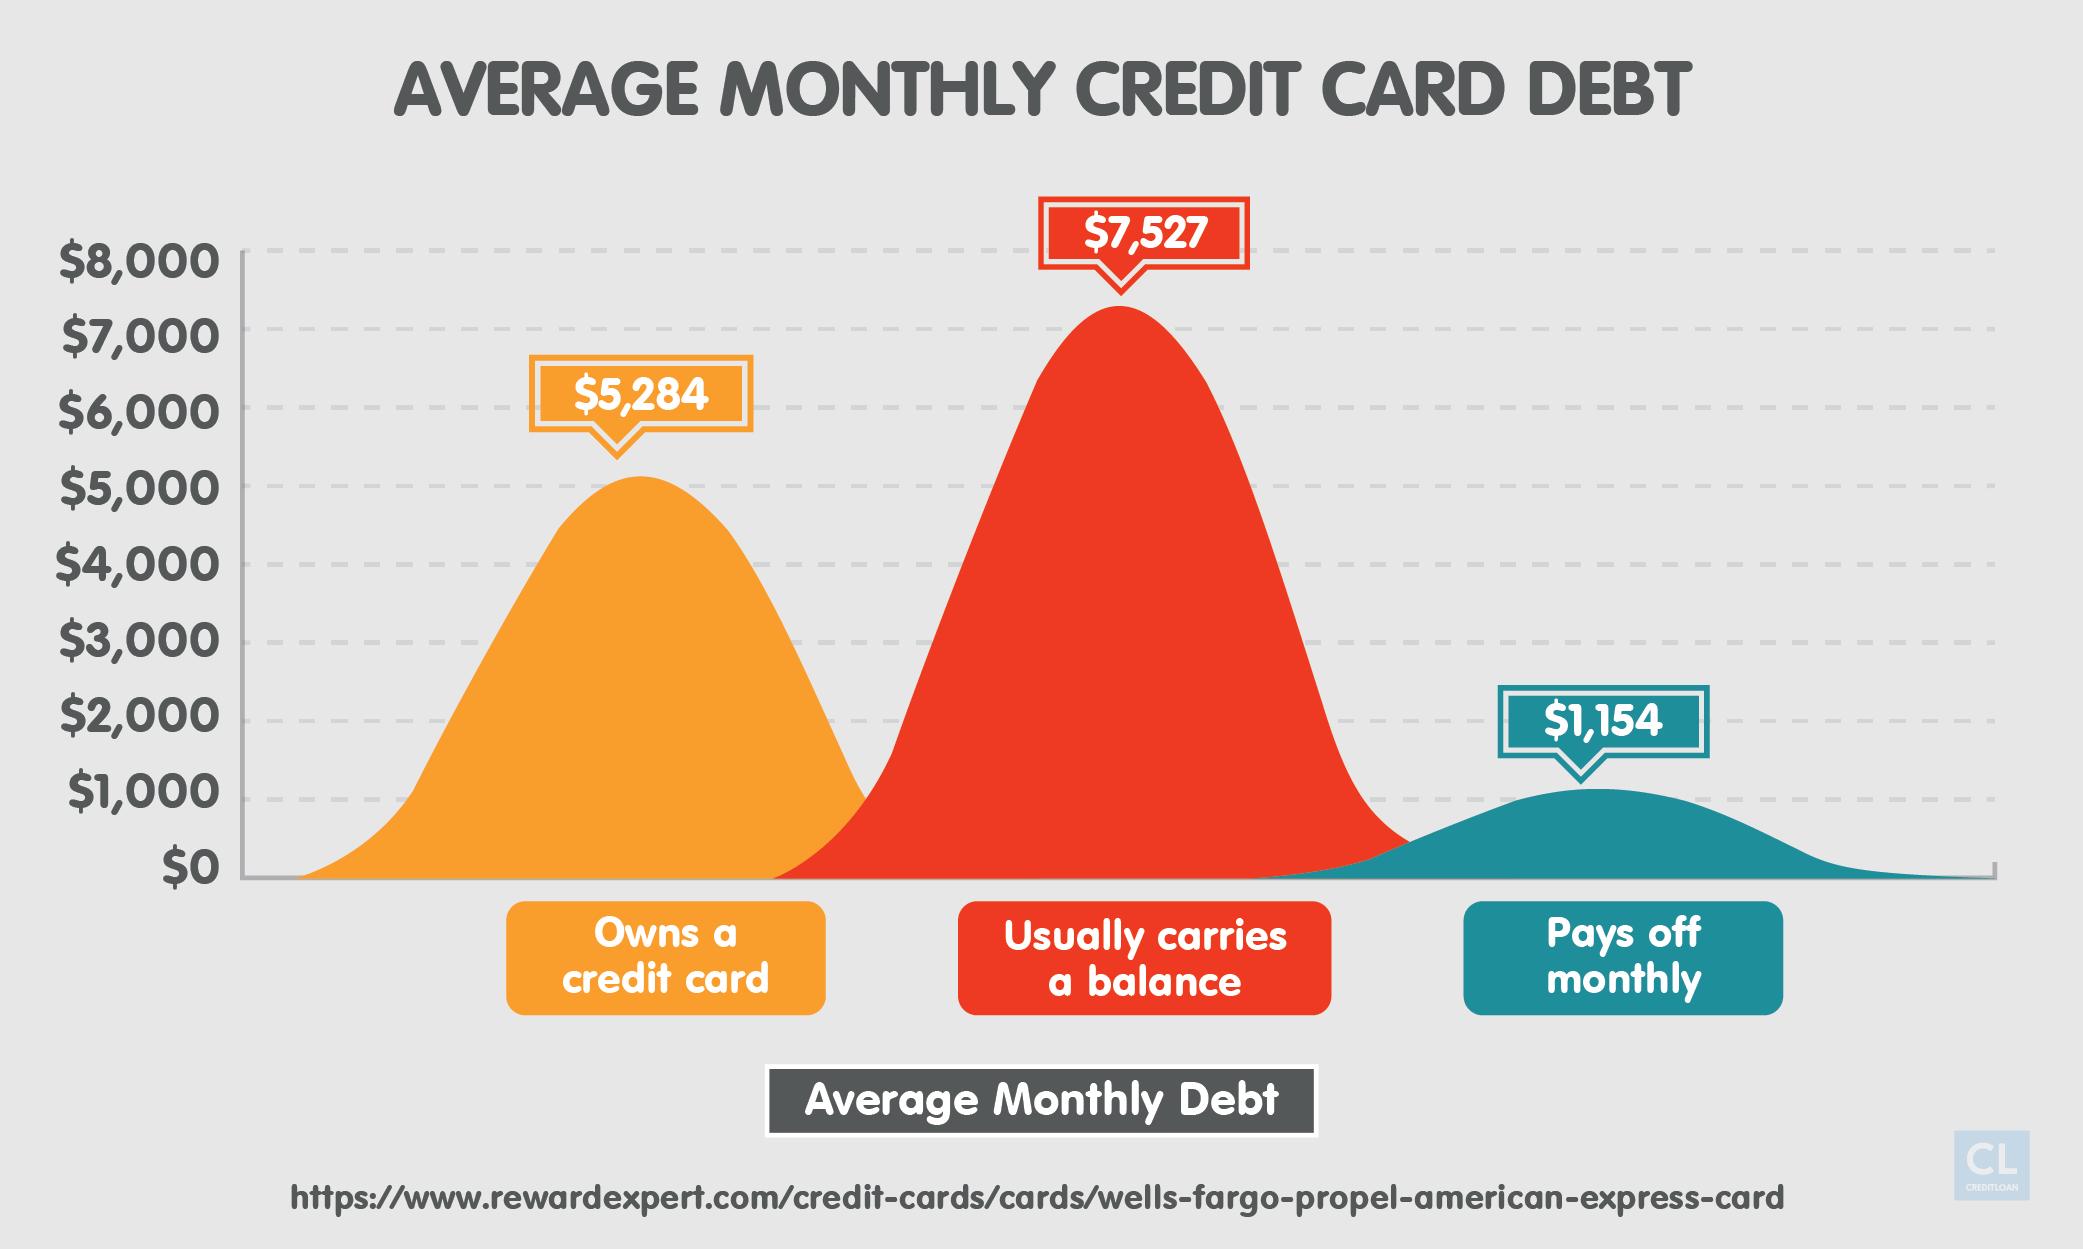 Average Monthly Credit Card Debt